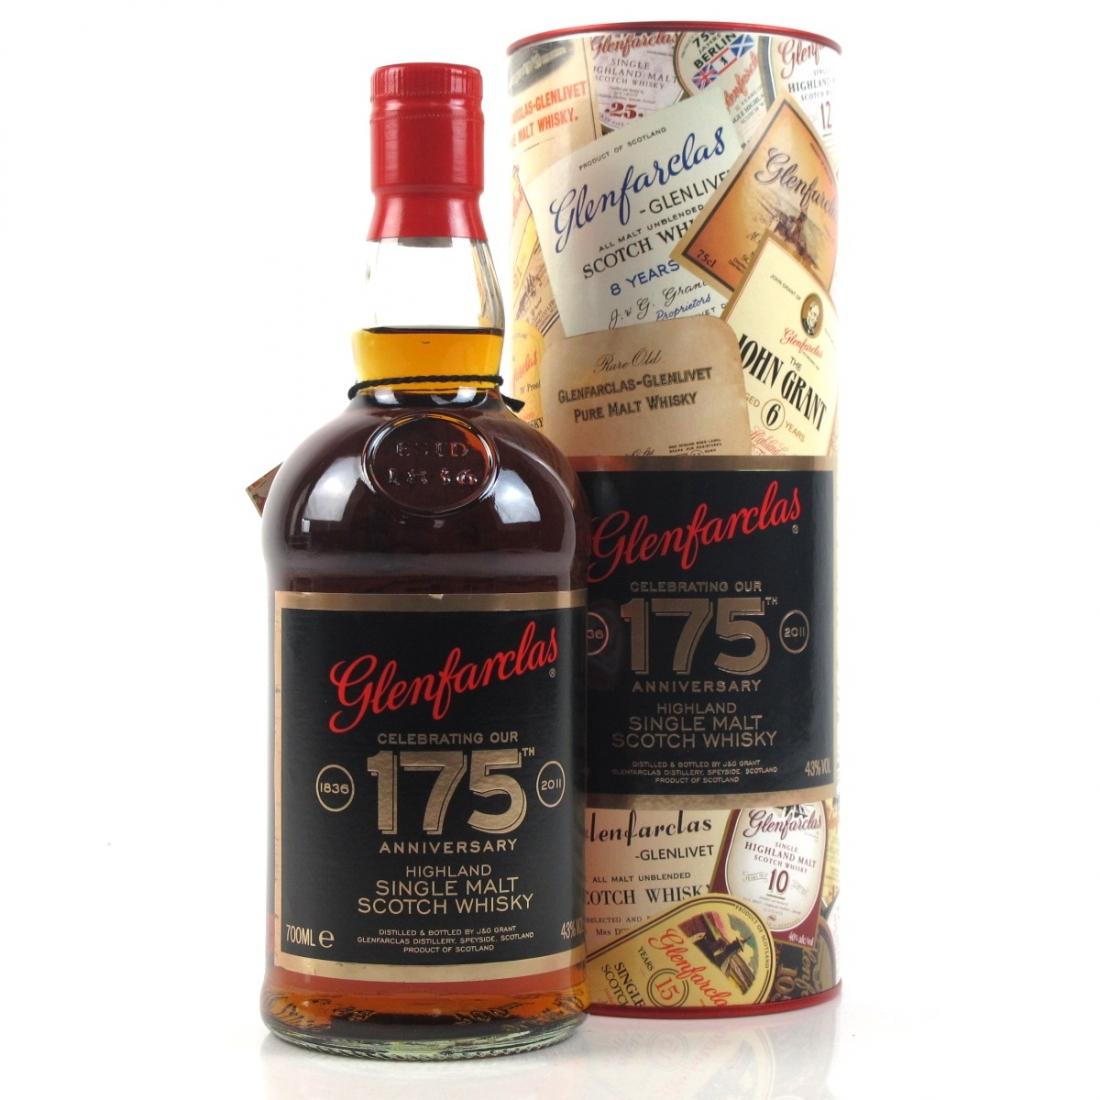 Glenfarclas 175th Anniversary